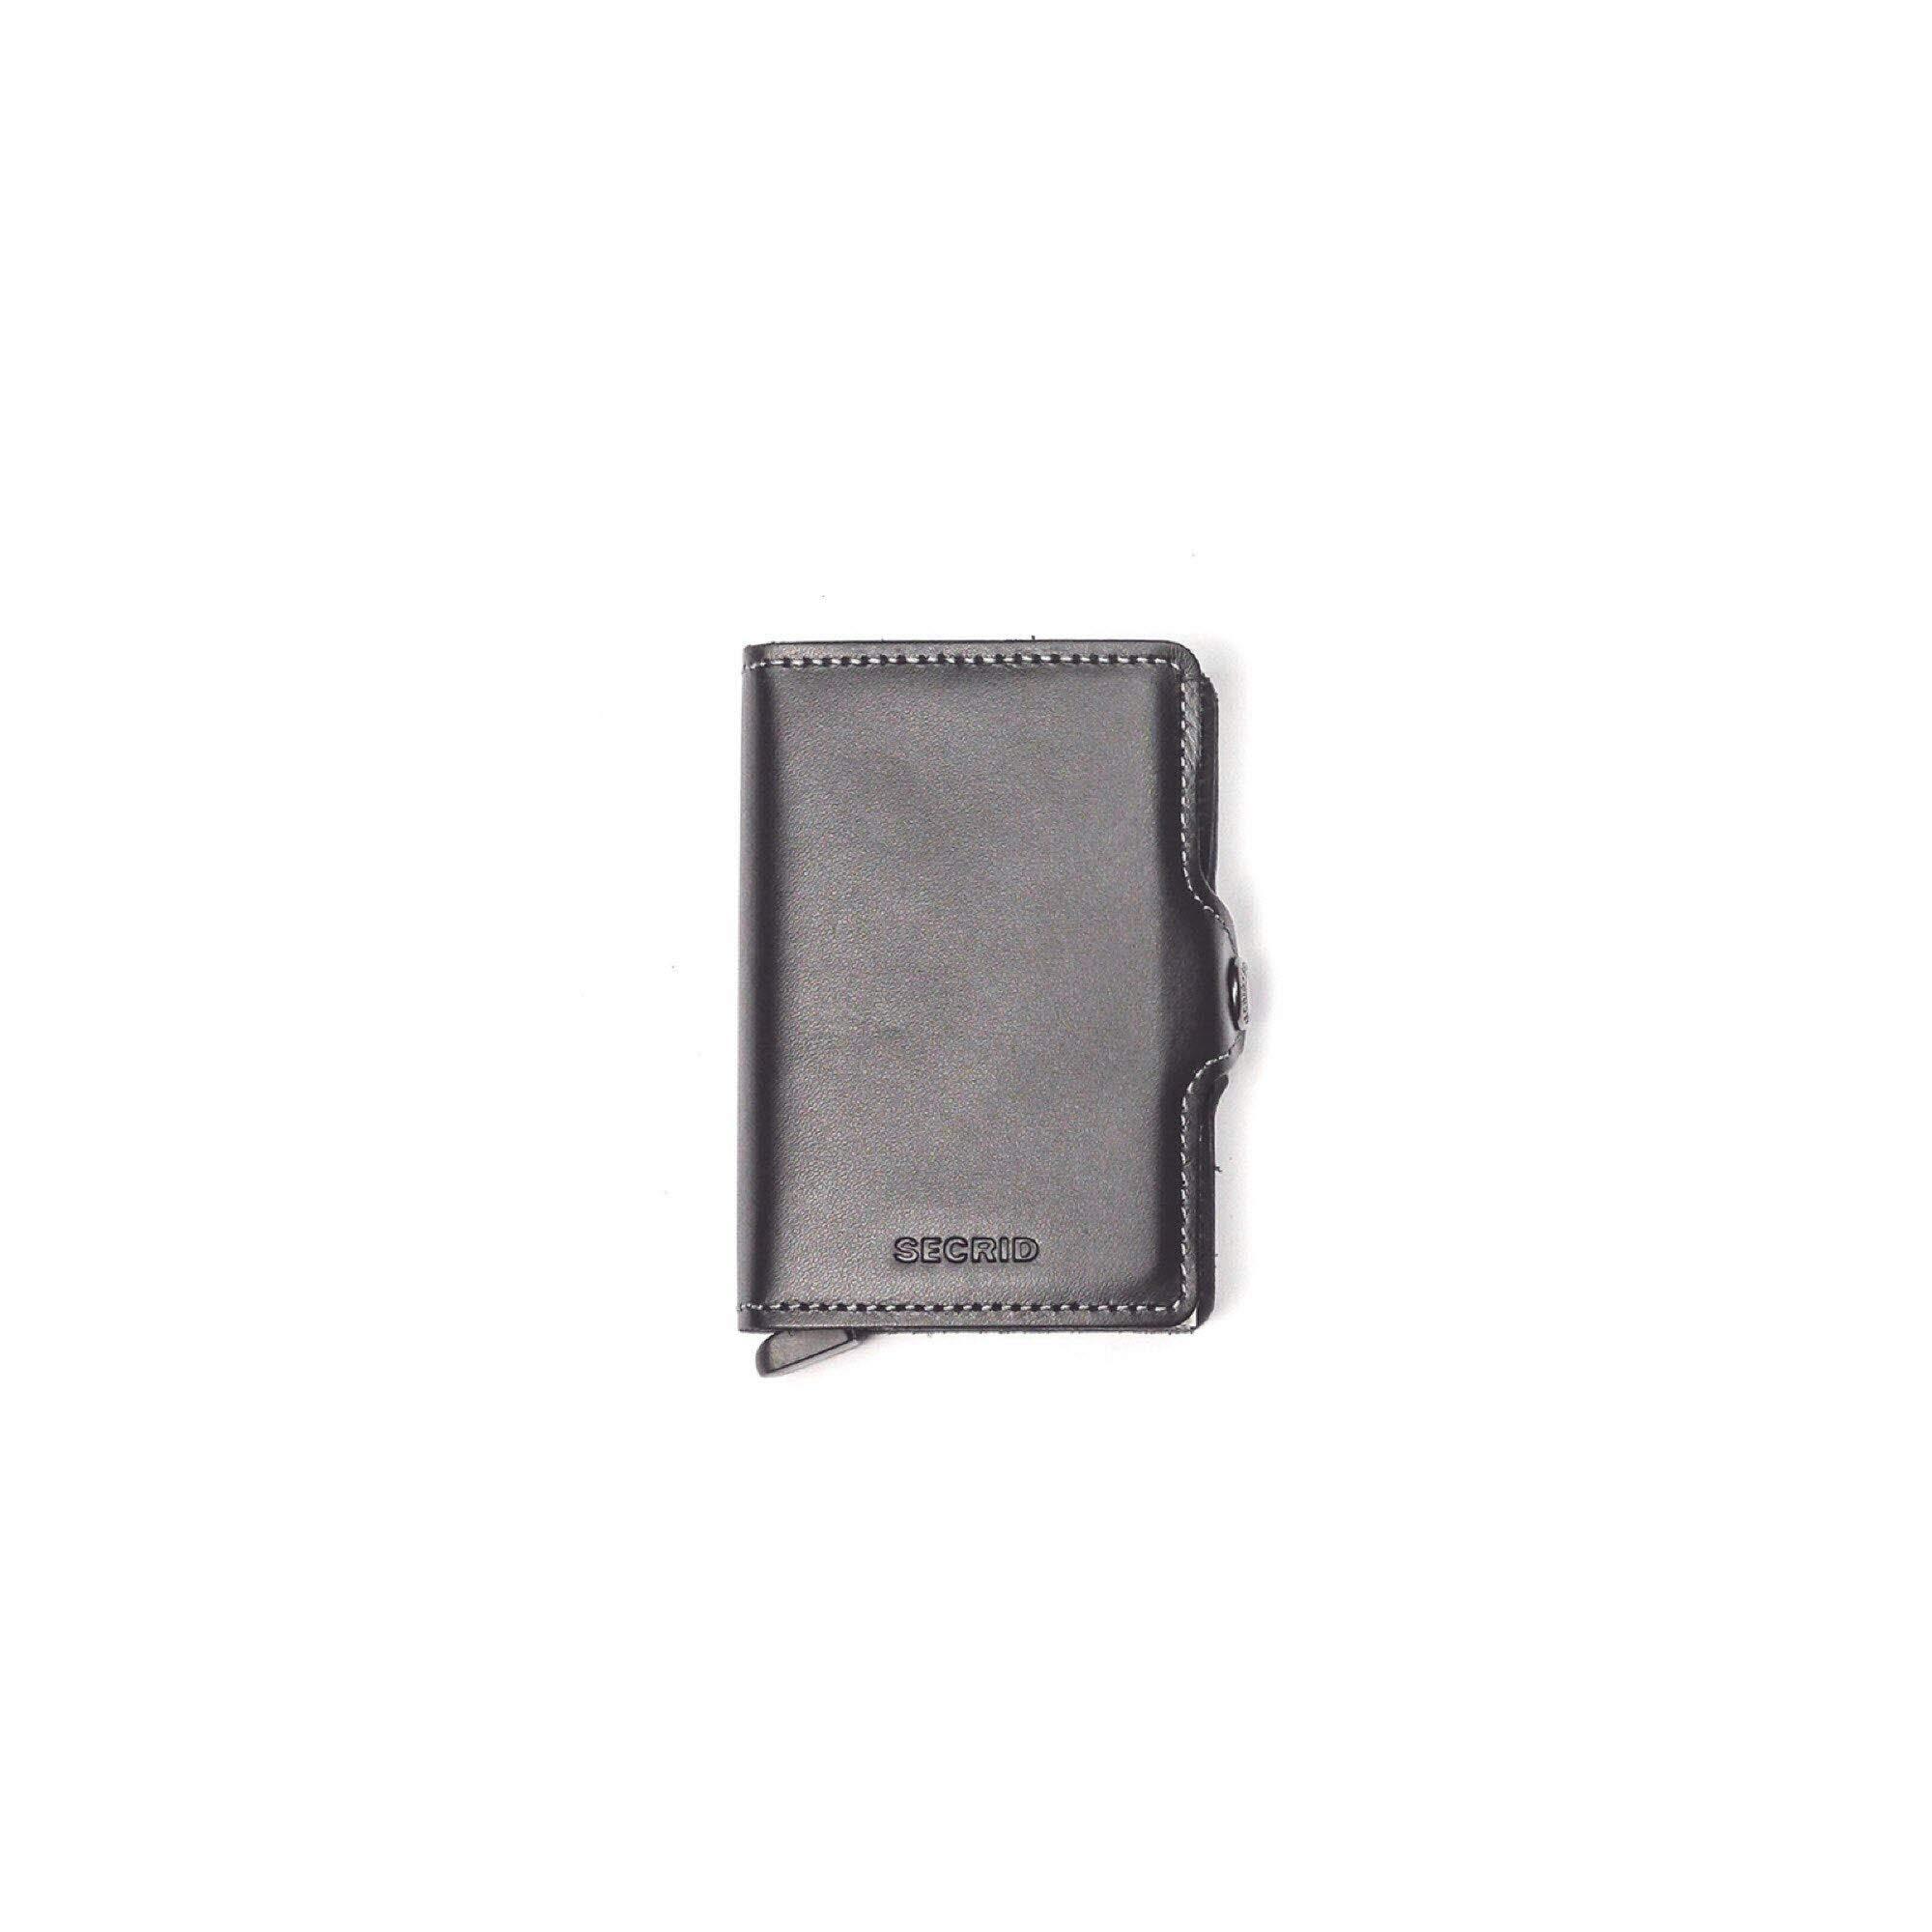 Secrid Twinwallet ORIGINAL Black wallet